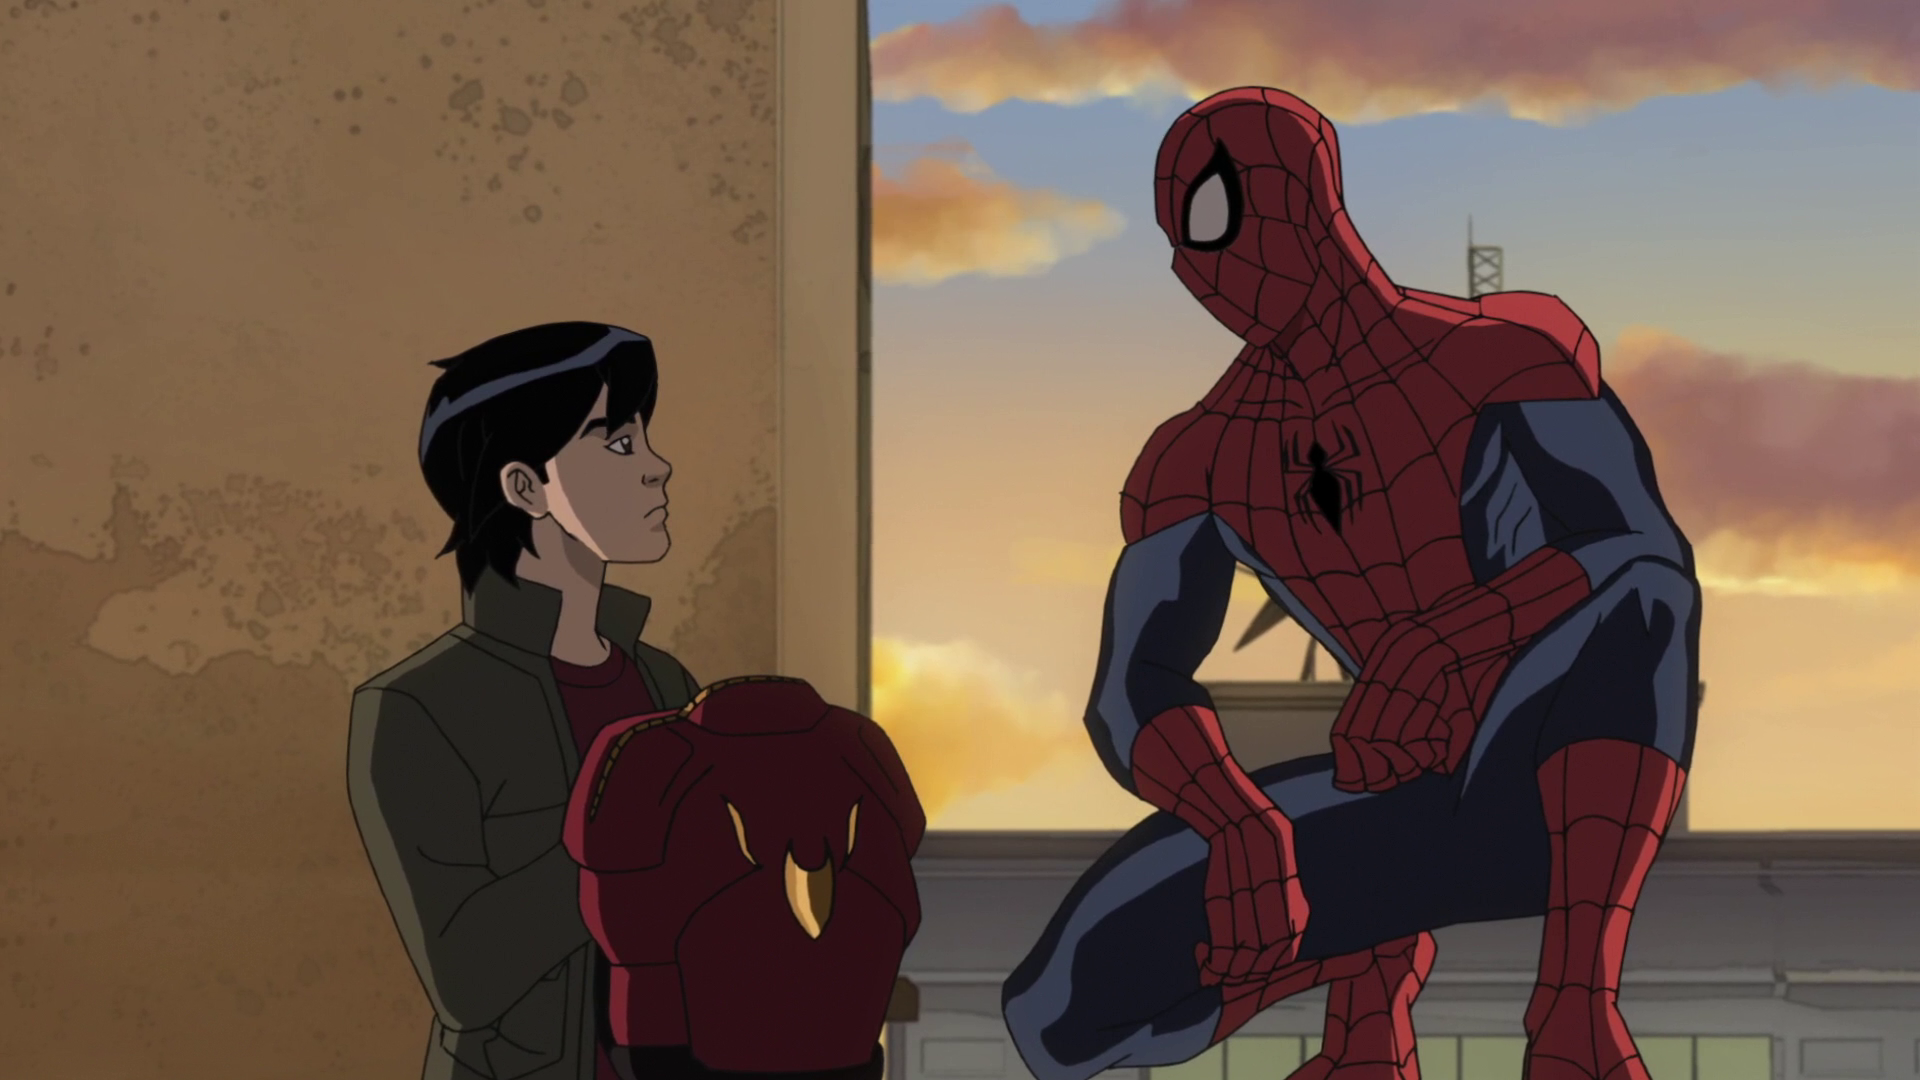 Image - Amadeus Cho and Spider-Man 2.png | Disney Wiki | Fandom ...